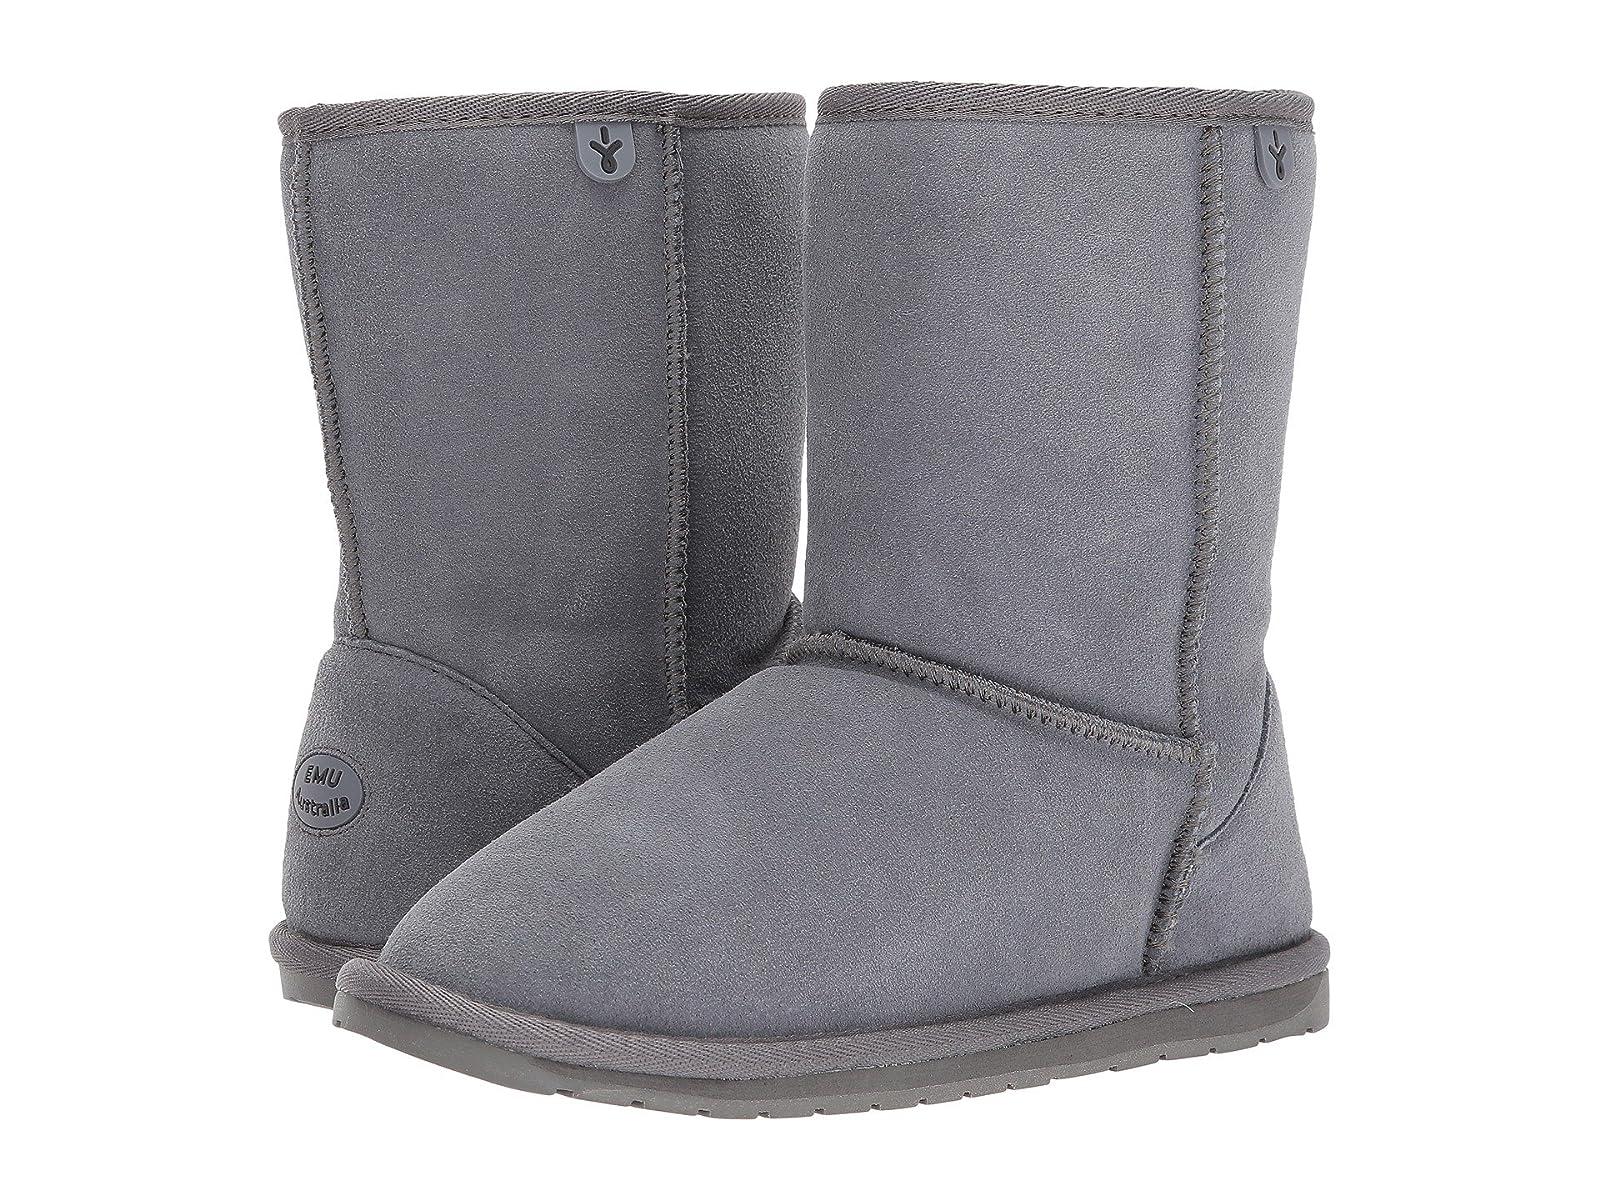 EMU Australia Kids Wallaby Lo Teens (Big Kid)Affordable and distinctive shoes